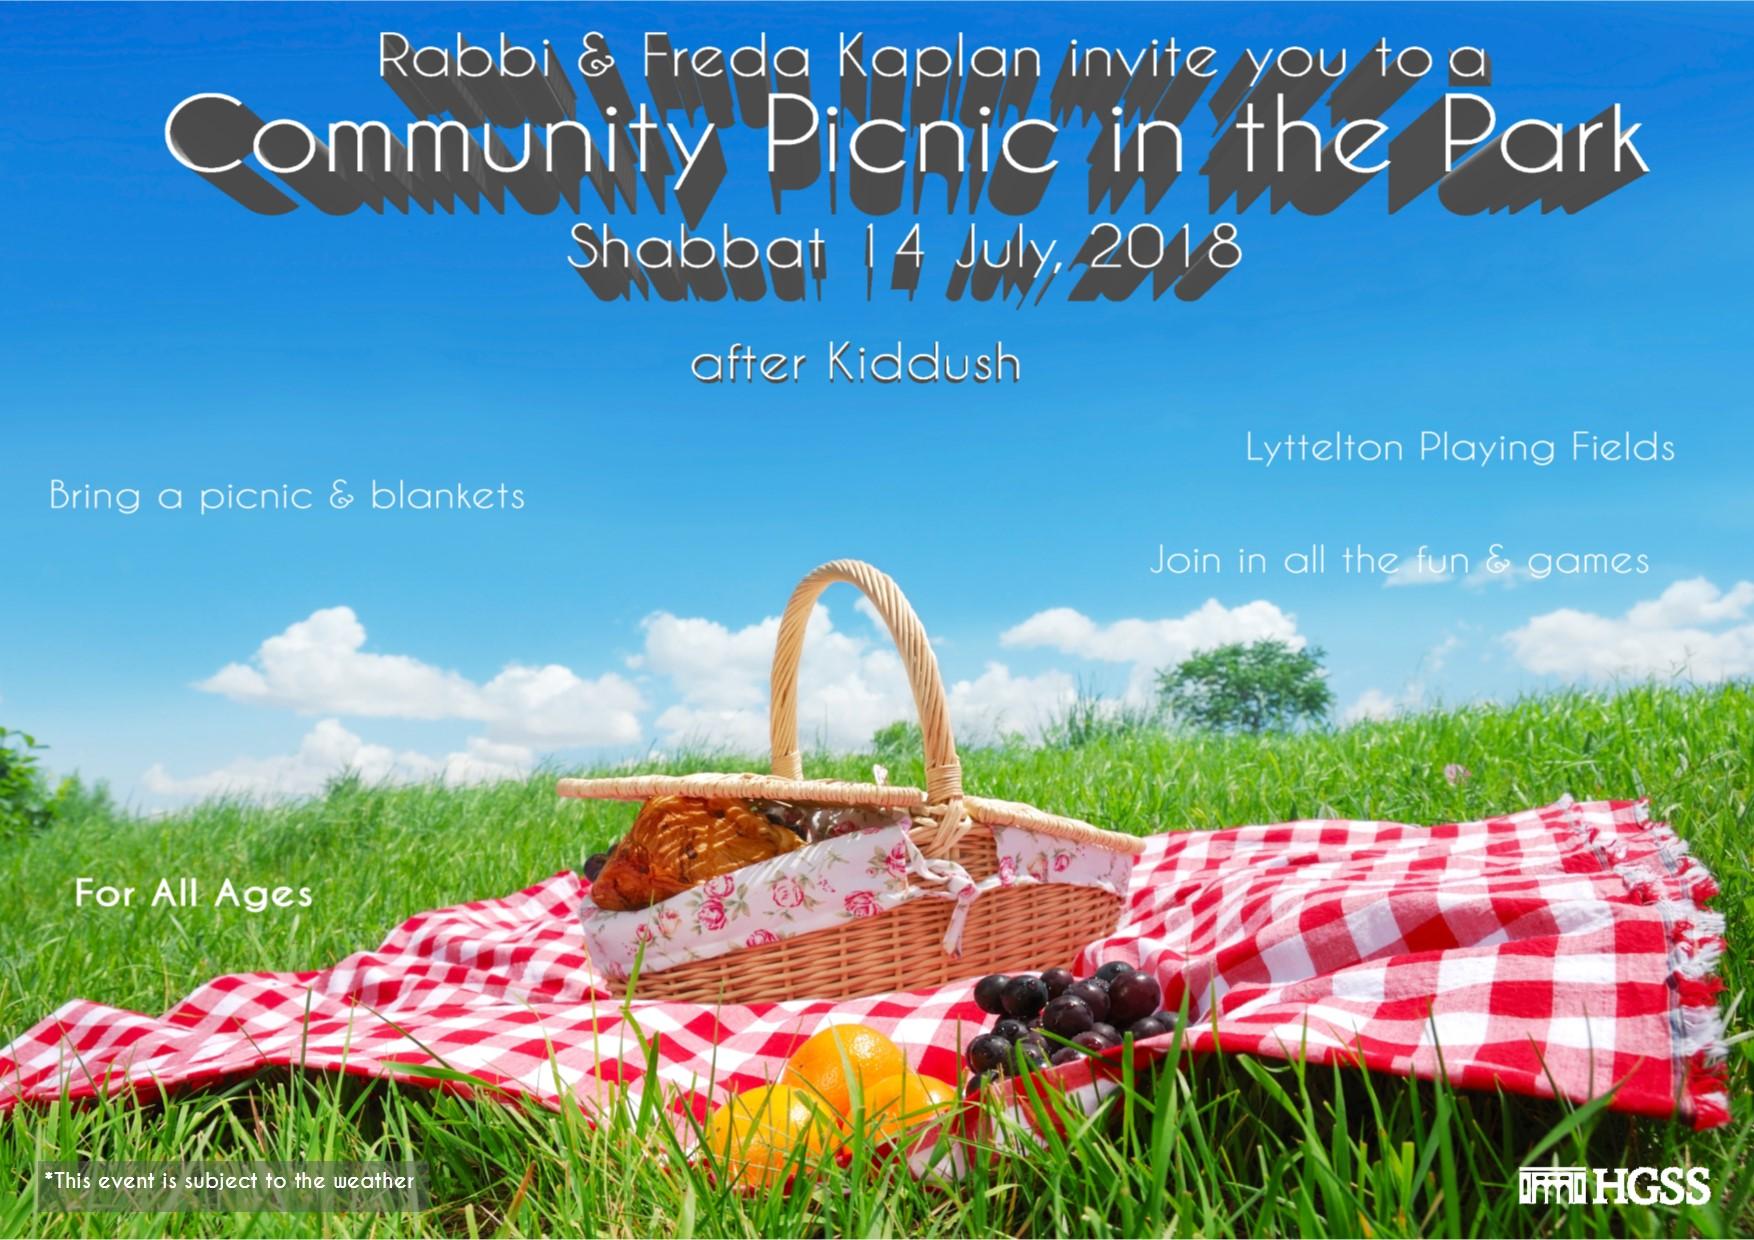 Summer Community Picnic @ Lyttelton Park